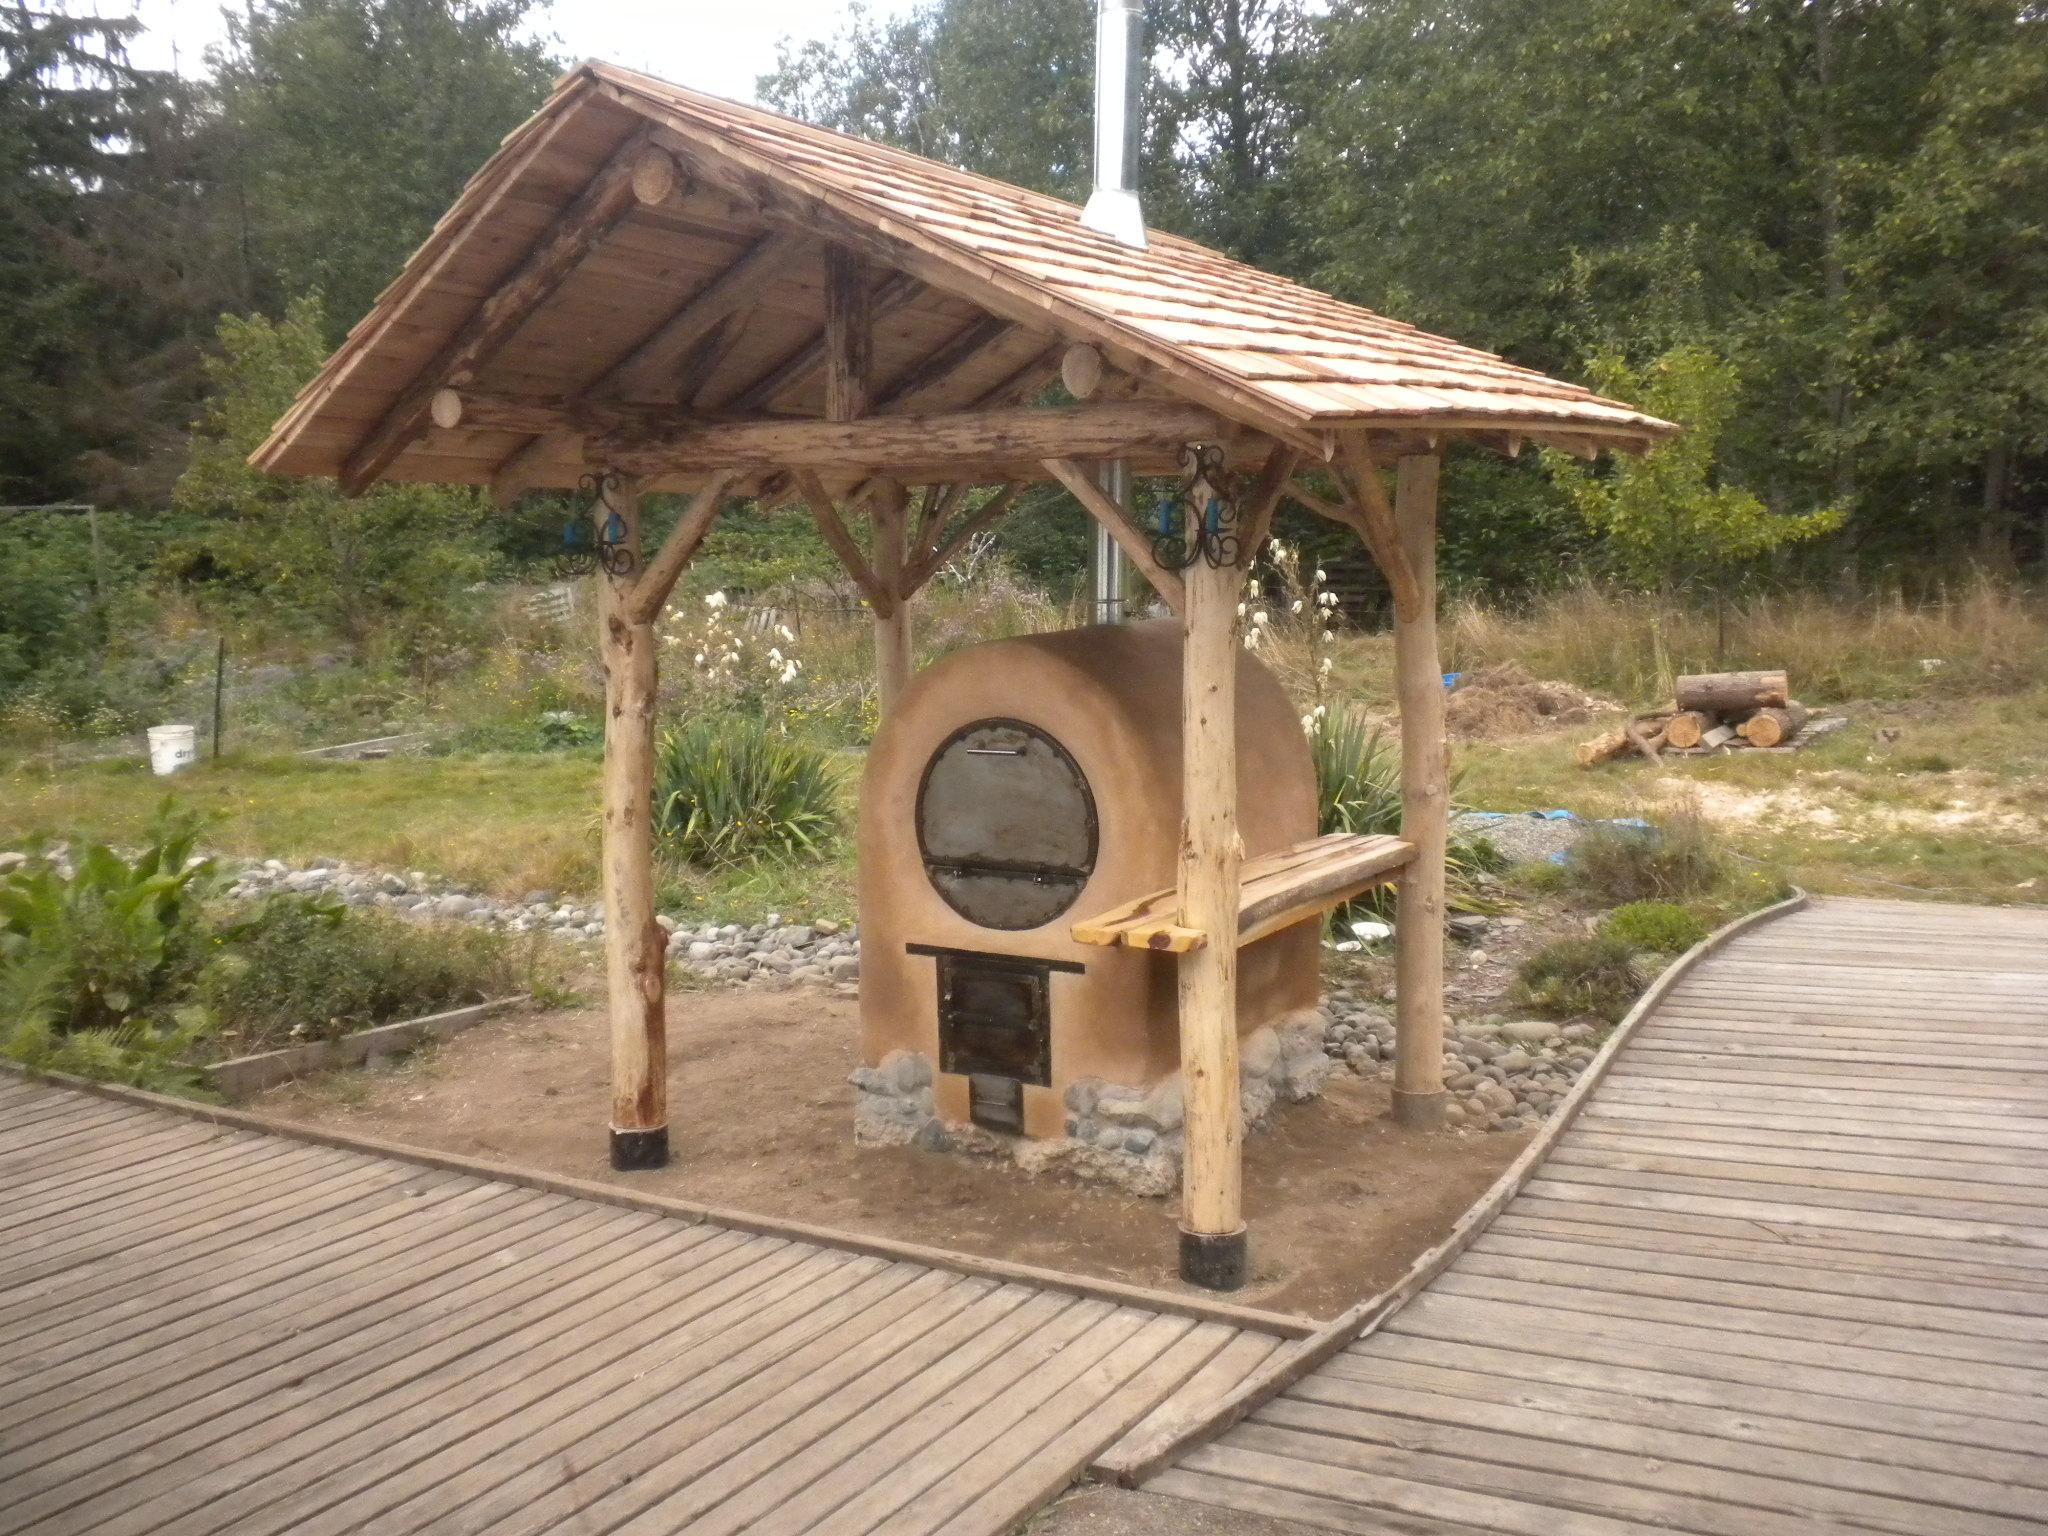 Hawthorn Farm Adobe Barrel Oven Firespeaking